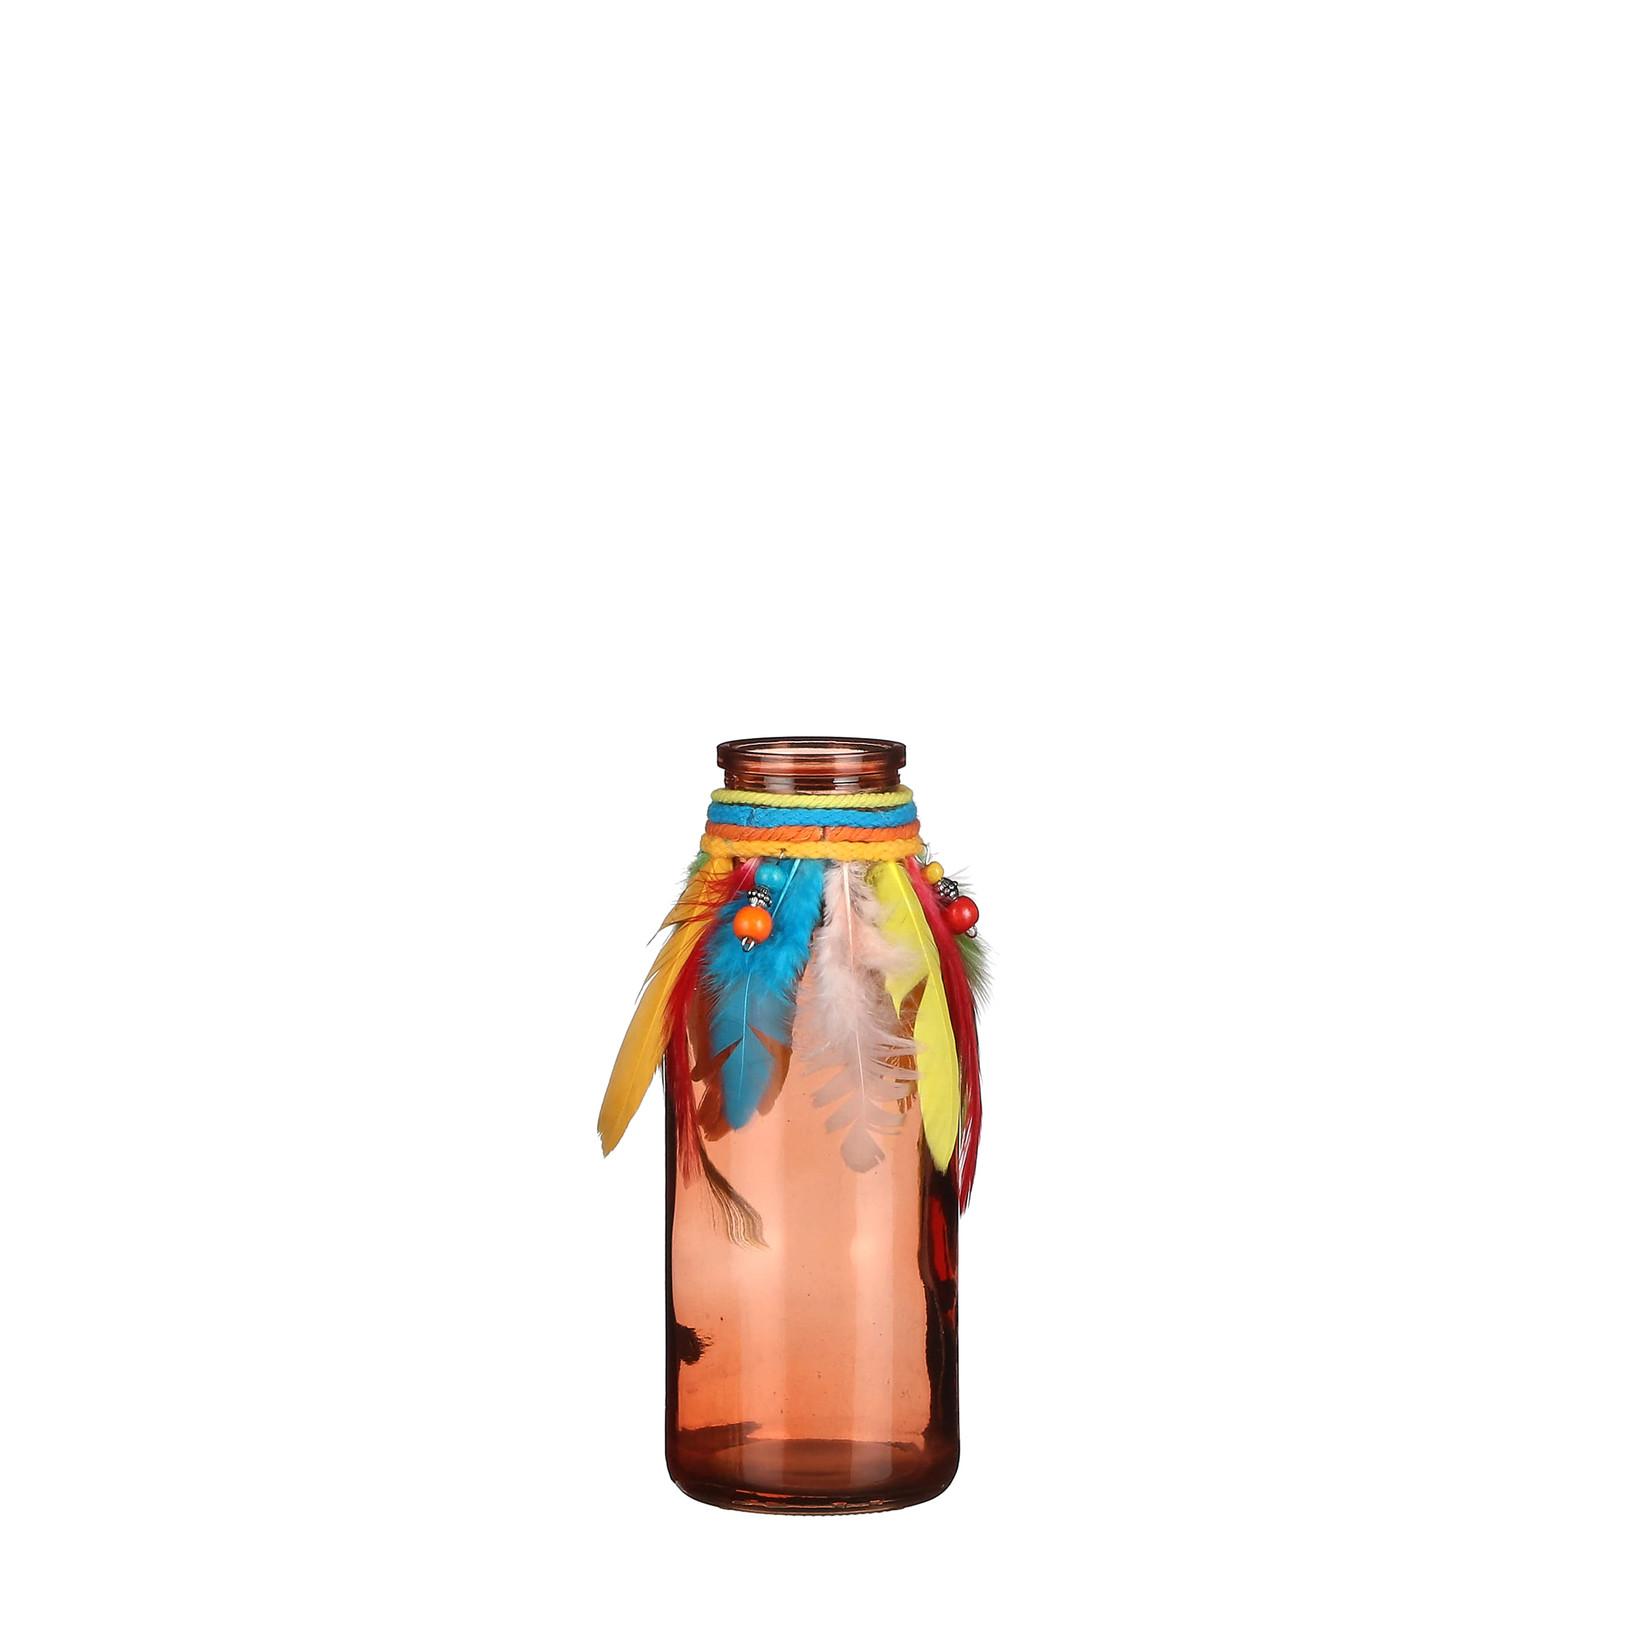 MiCa 1056787 Vase feather orange